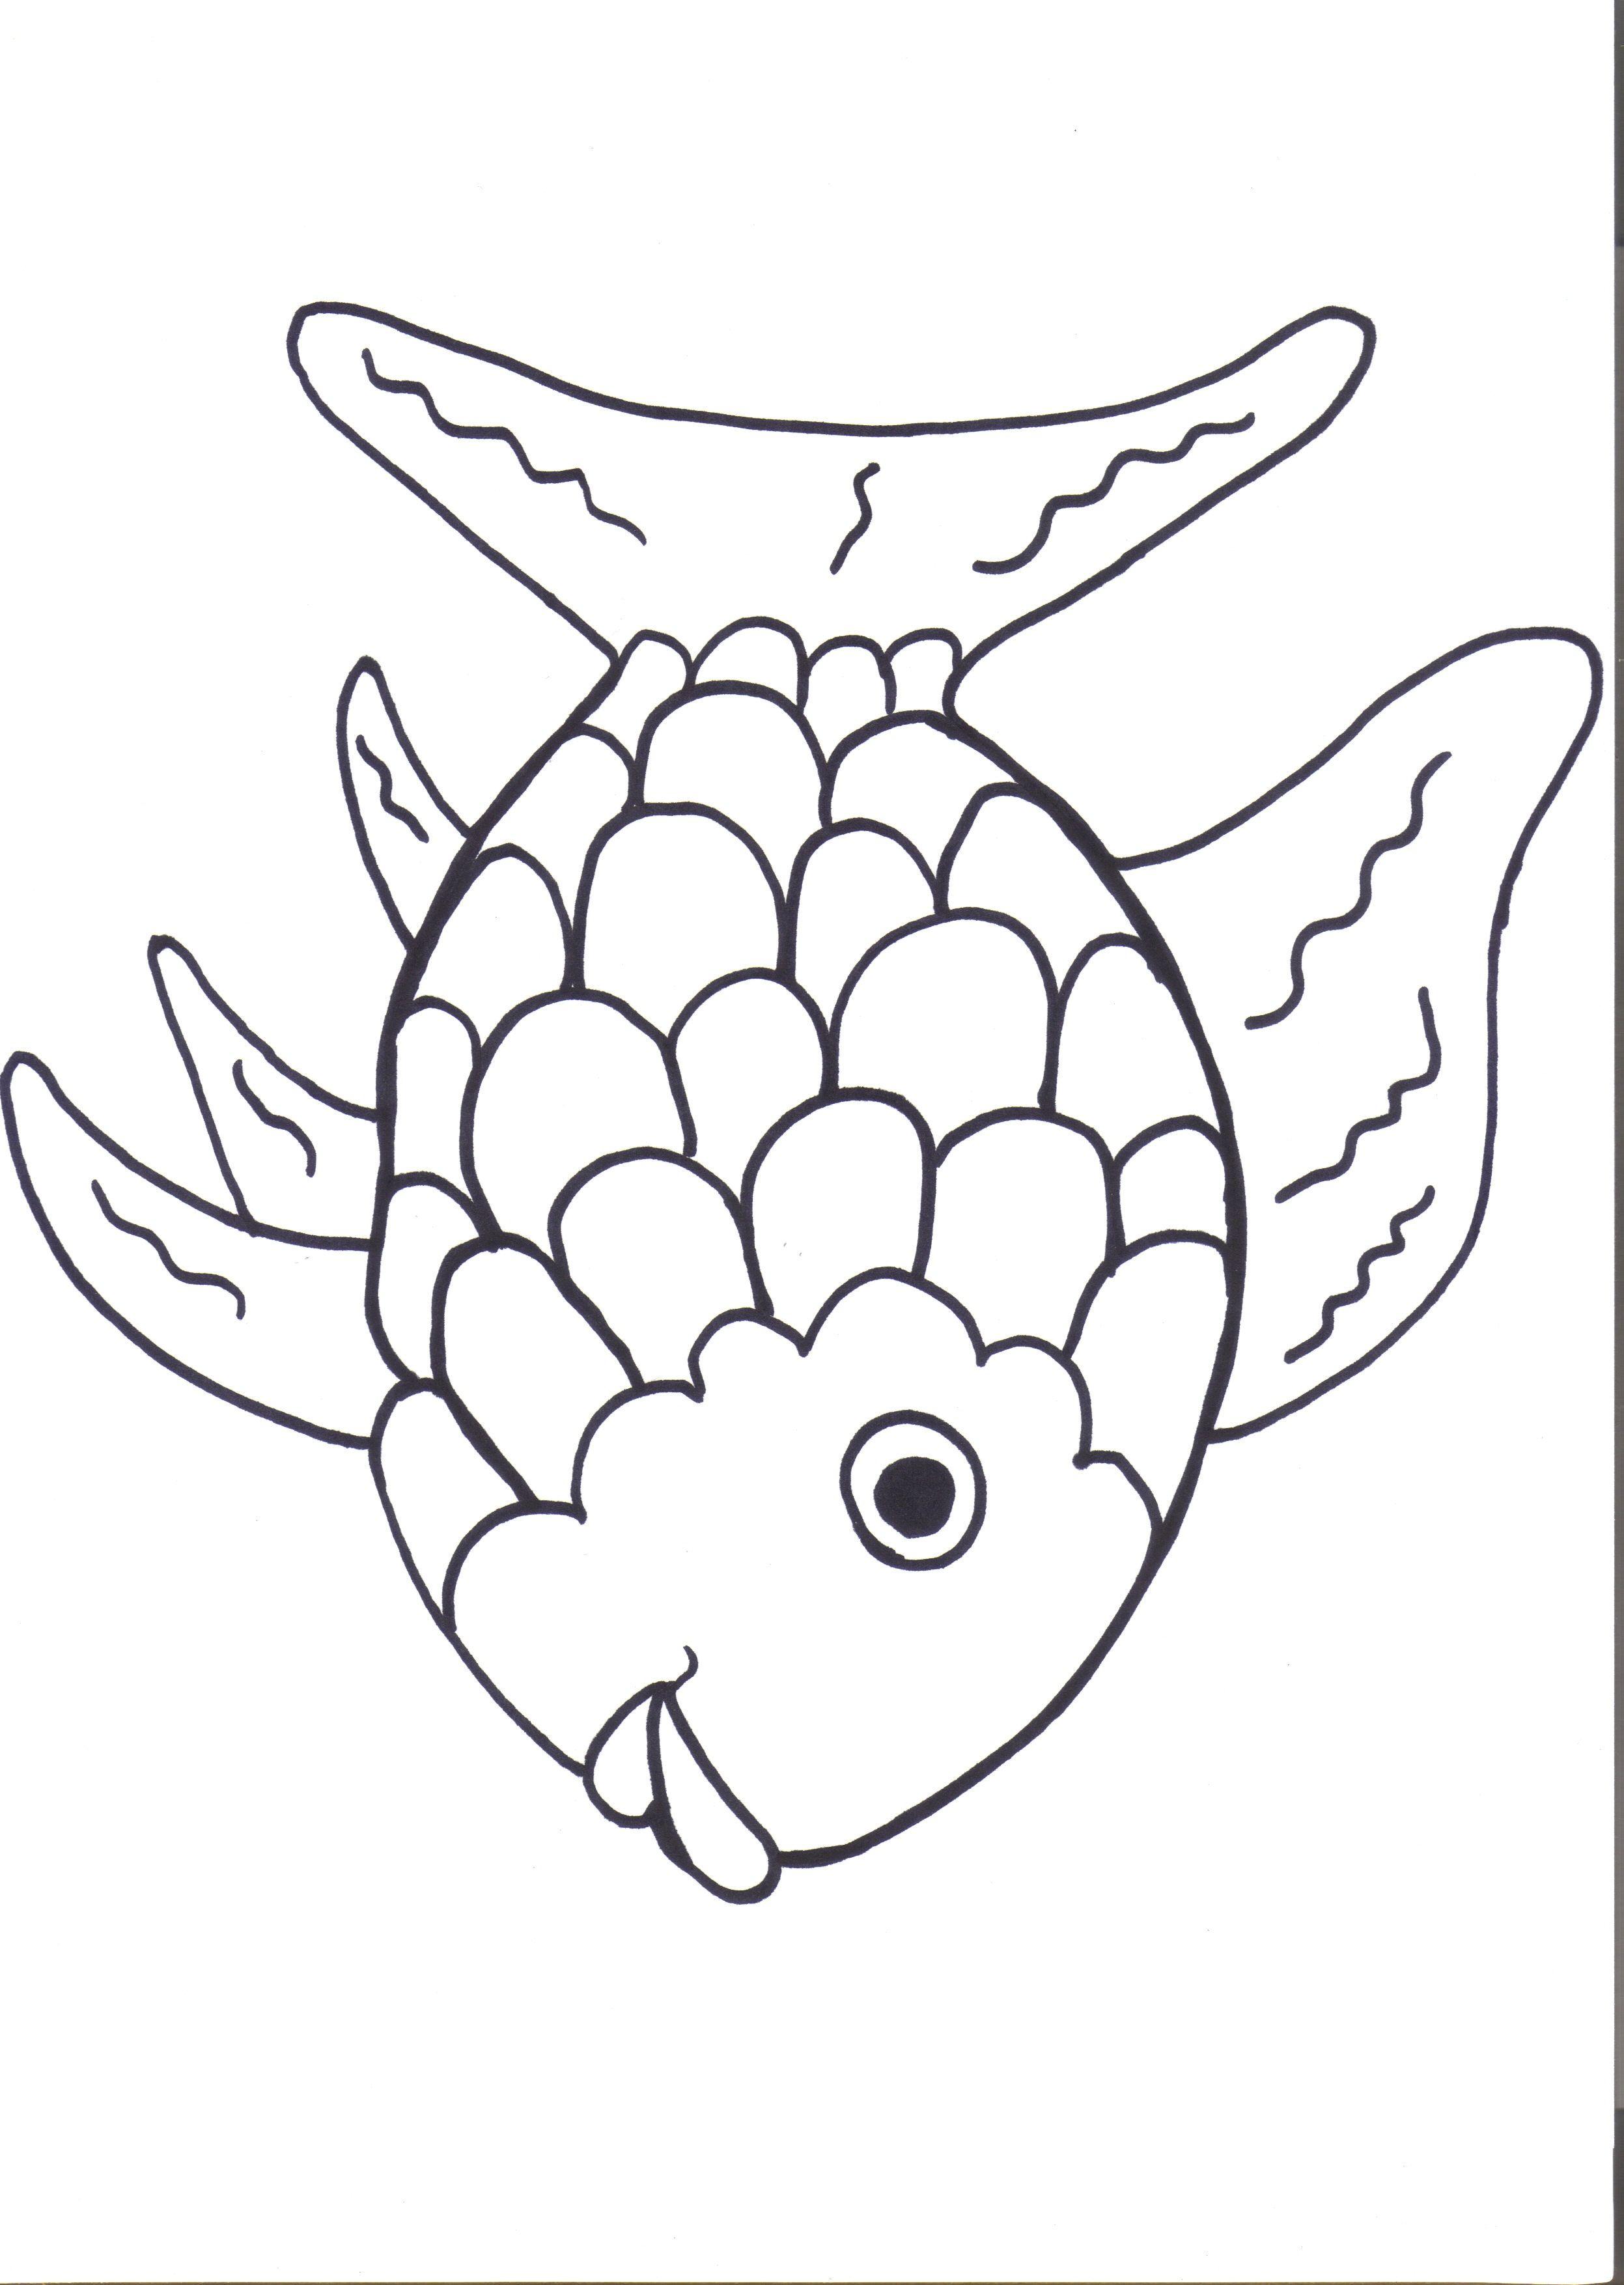 Rainbow Fish Printables August Preschool Themes | Child Care | Rainbow Fish Printable Worksheets